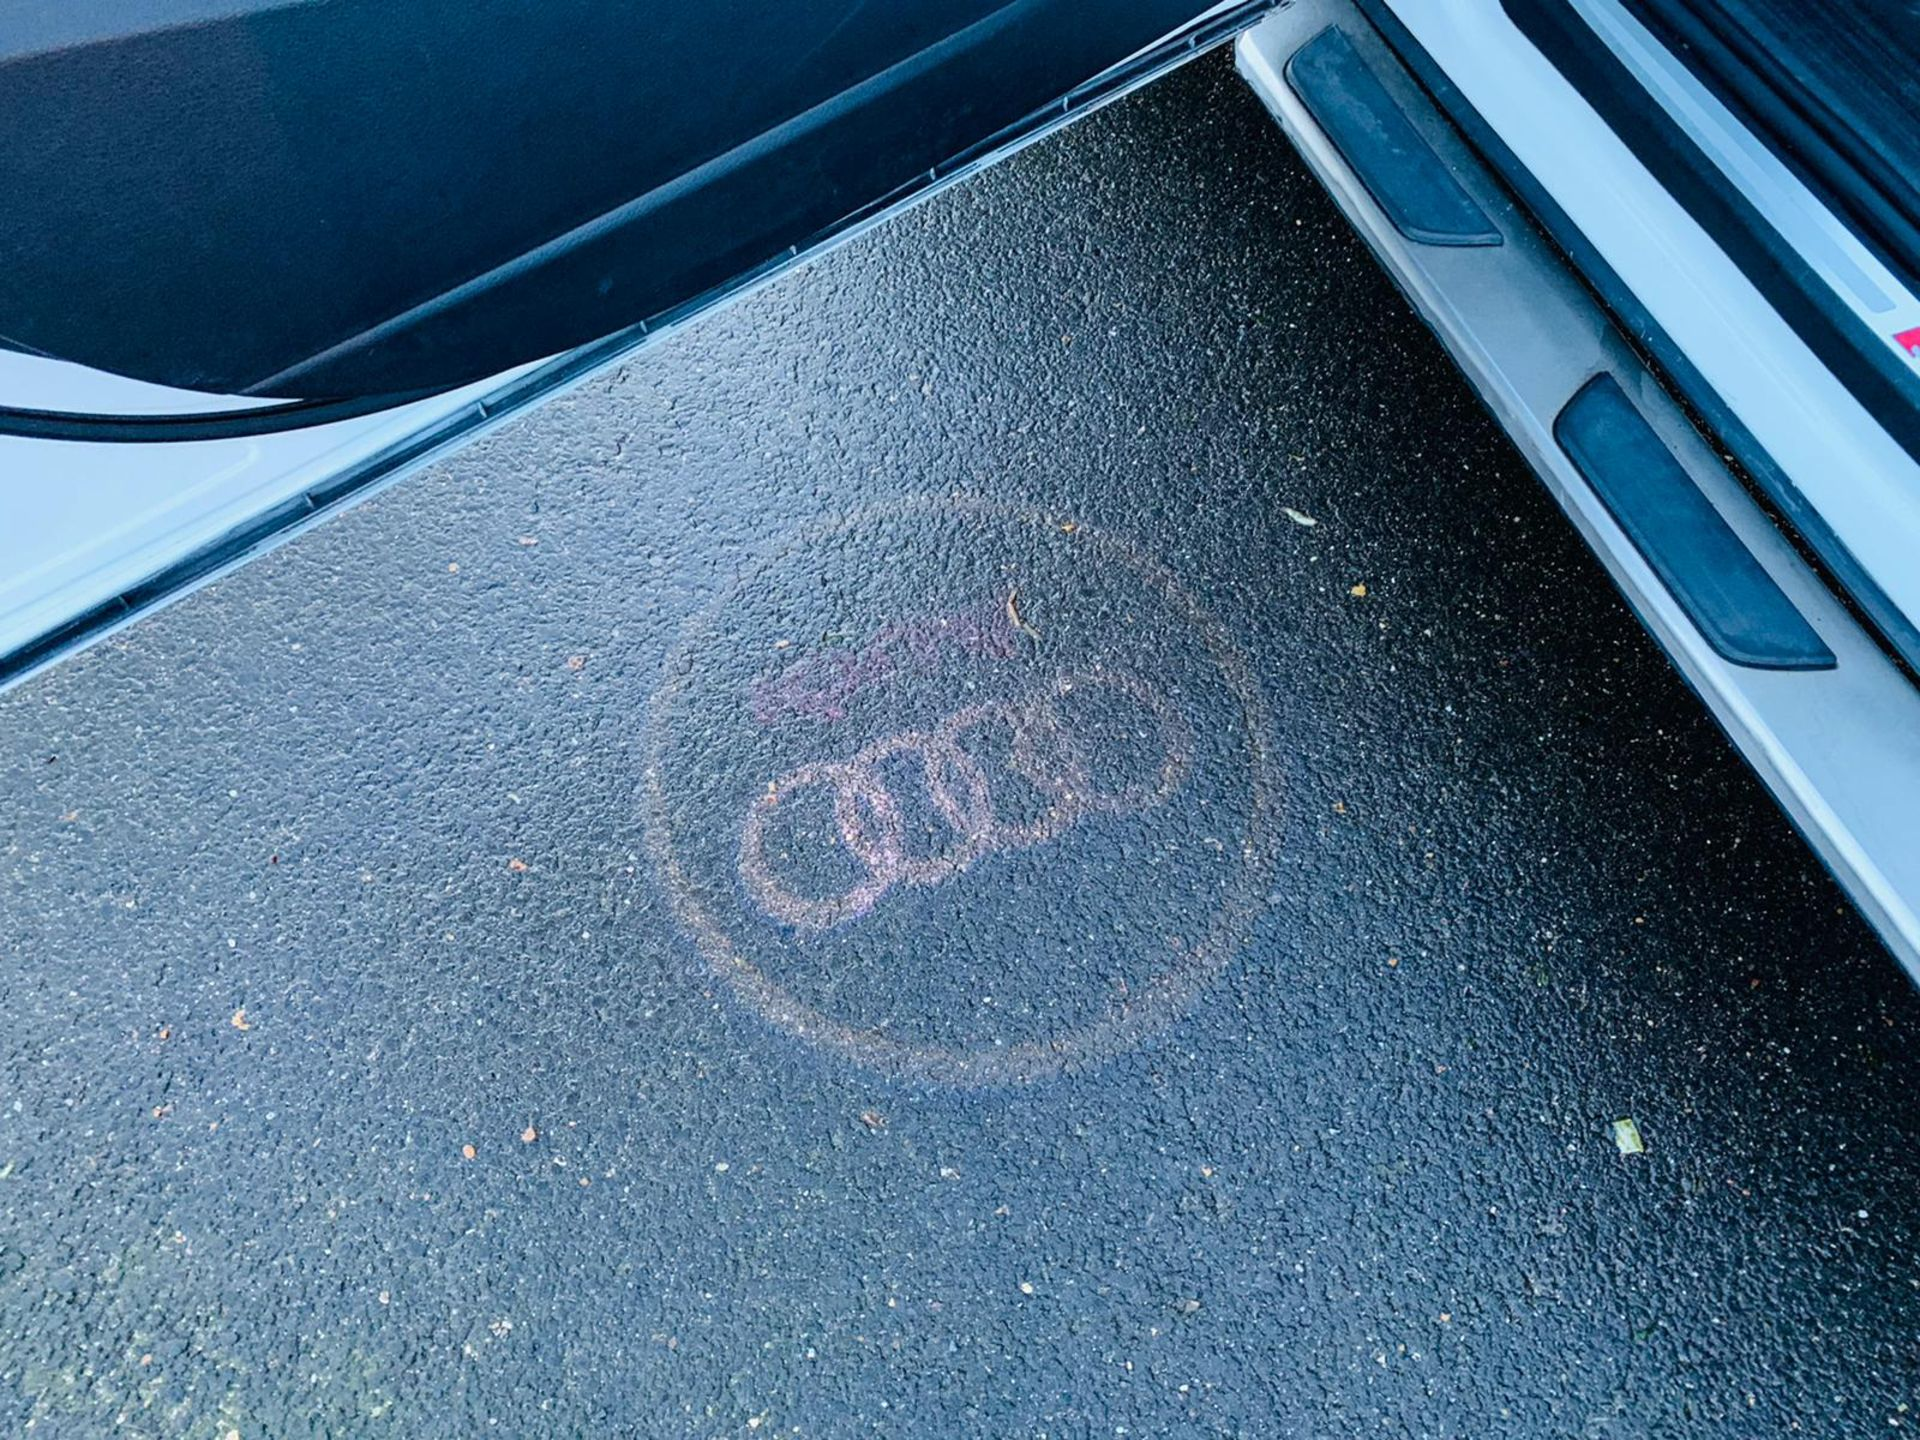 (Reserve Met)Audi Q7 3.0 TDI Quattro S Line Plus Auto (7 Seats) - 12 Reg - Only 63k Miles -Sat Nav- - Image 31 of 37